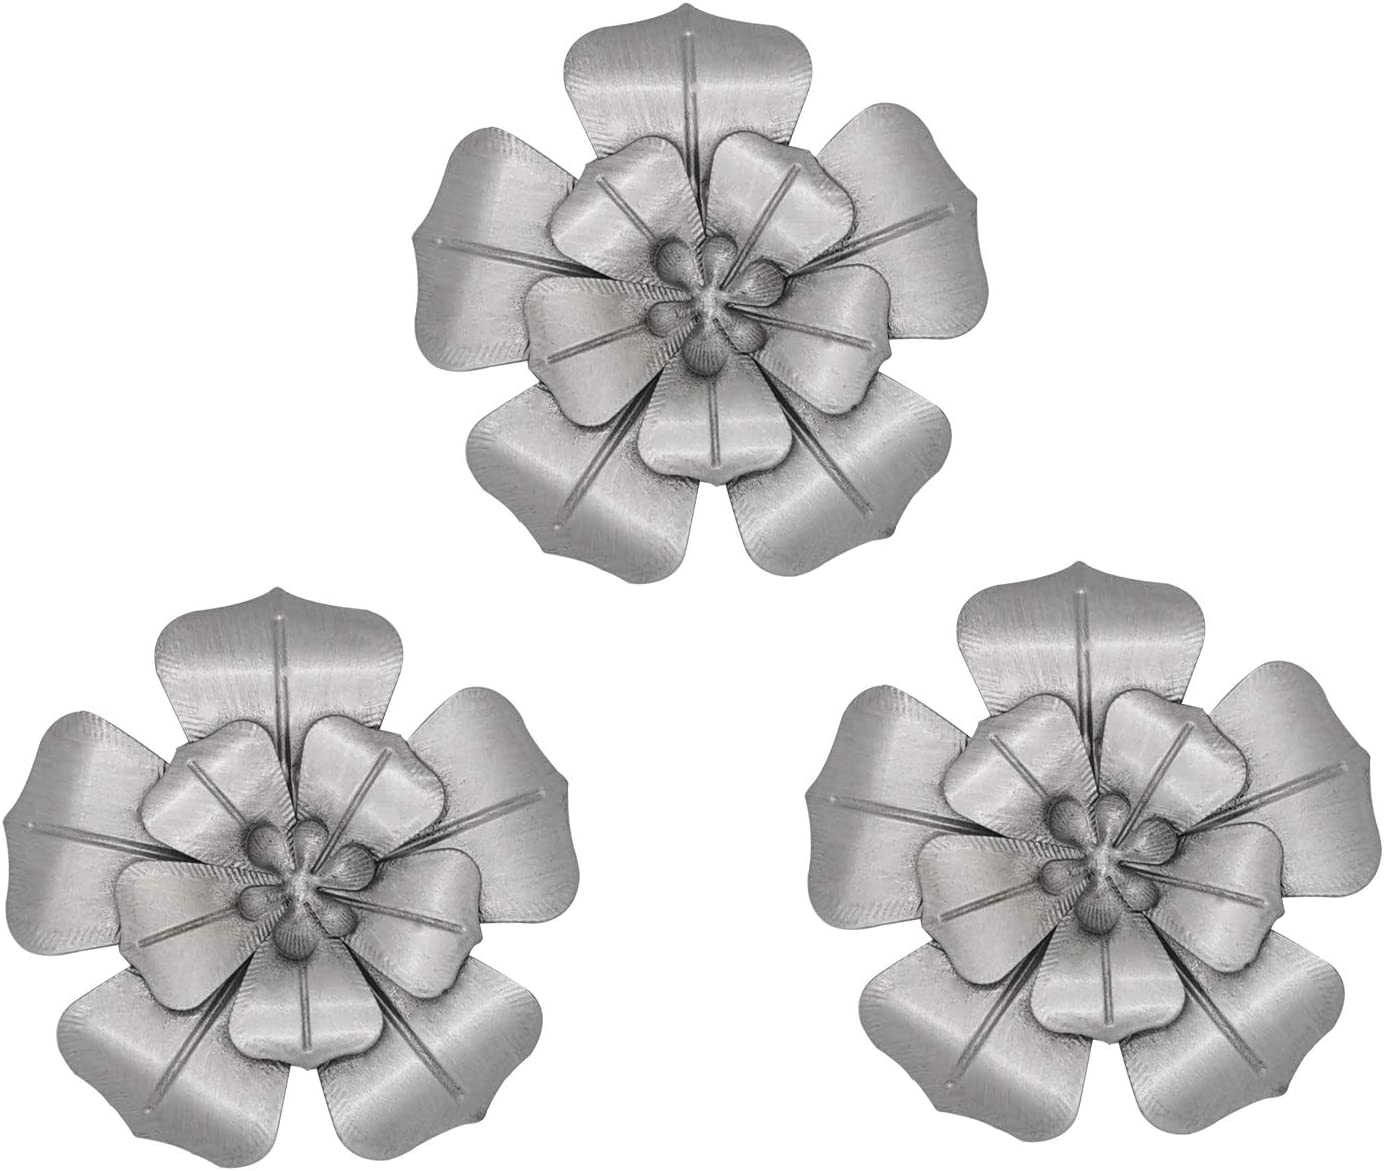 6 Inch Multiple Layer Metal Flower Wall Art Decor for Bedroom,Living Room Set of 3(sliver)